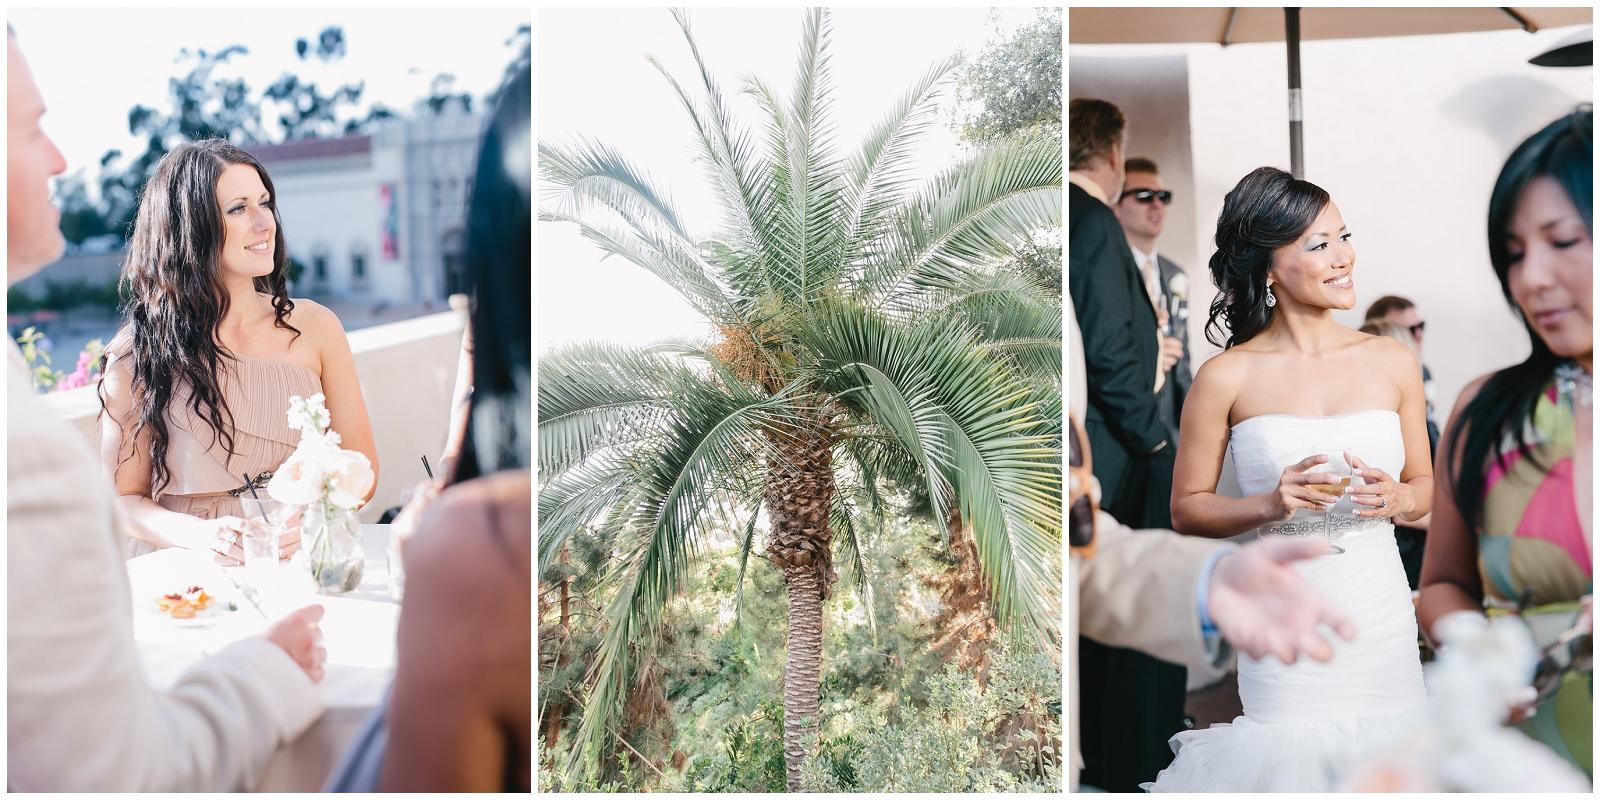 San-Francisco-Bay-Area-Wedding-Photography-Destination-20.jpg